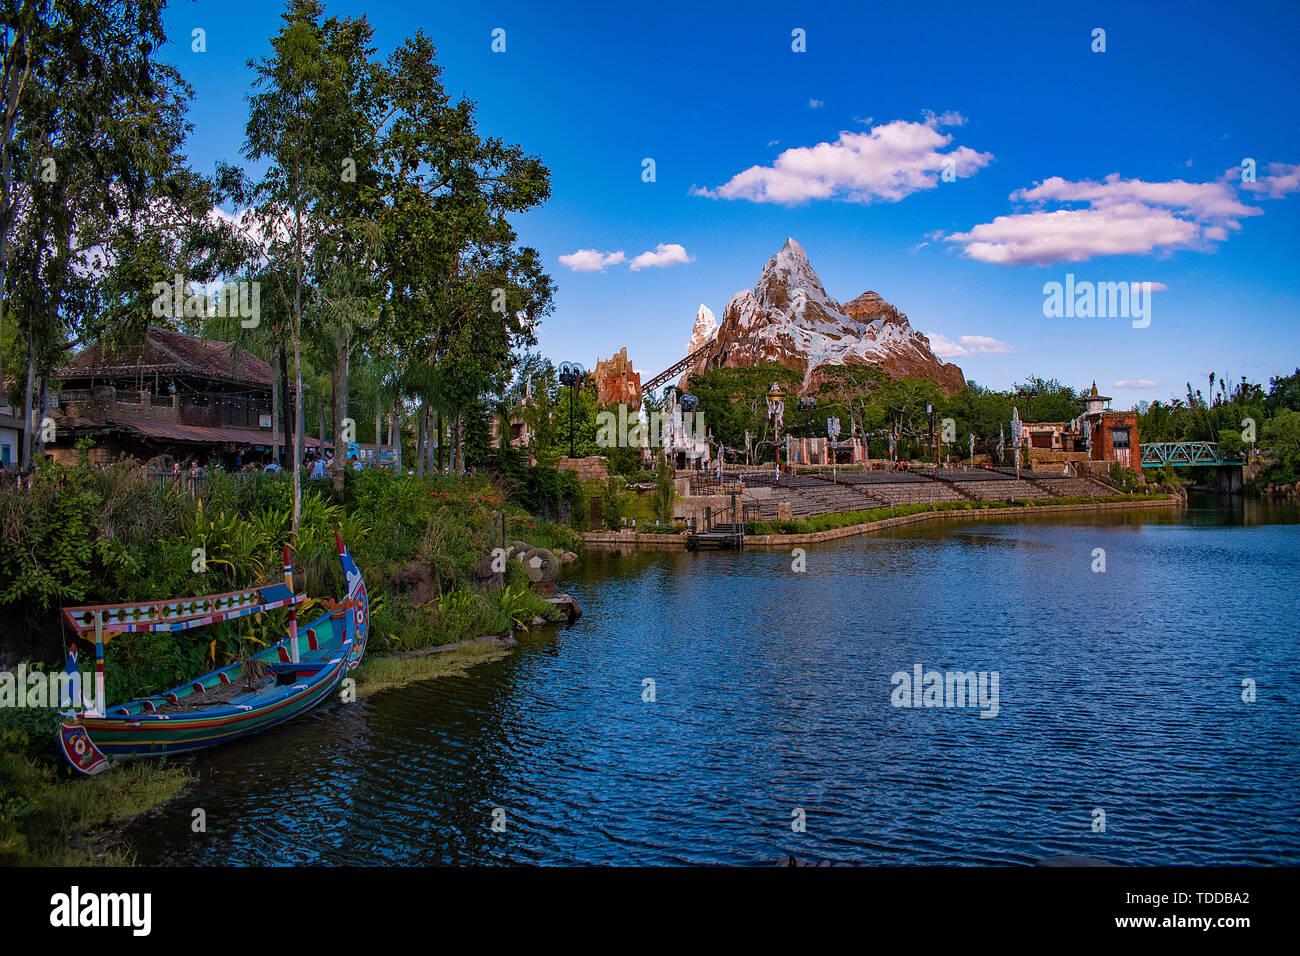 Orlando, Florida. Abril 29, 2019 coloridos barcos , lago azul y Expedition Everest mountain en el Reino Animal. Foto de stock